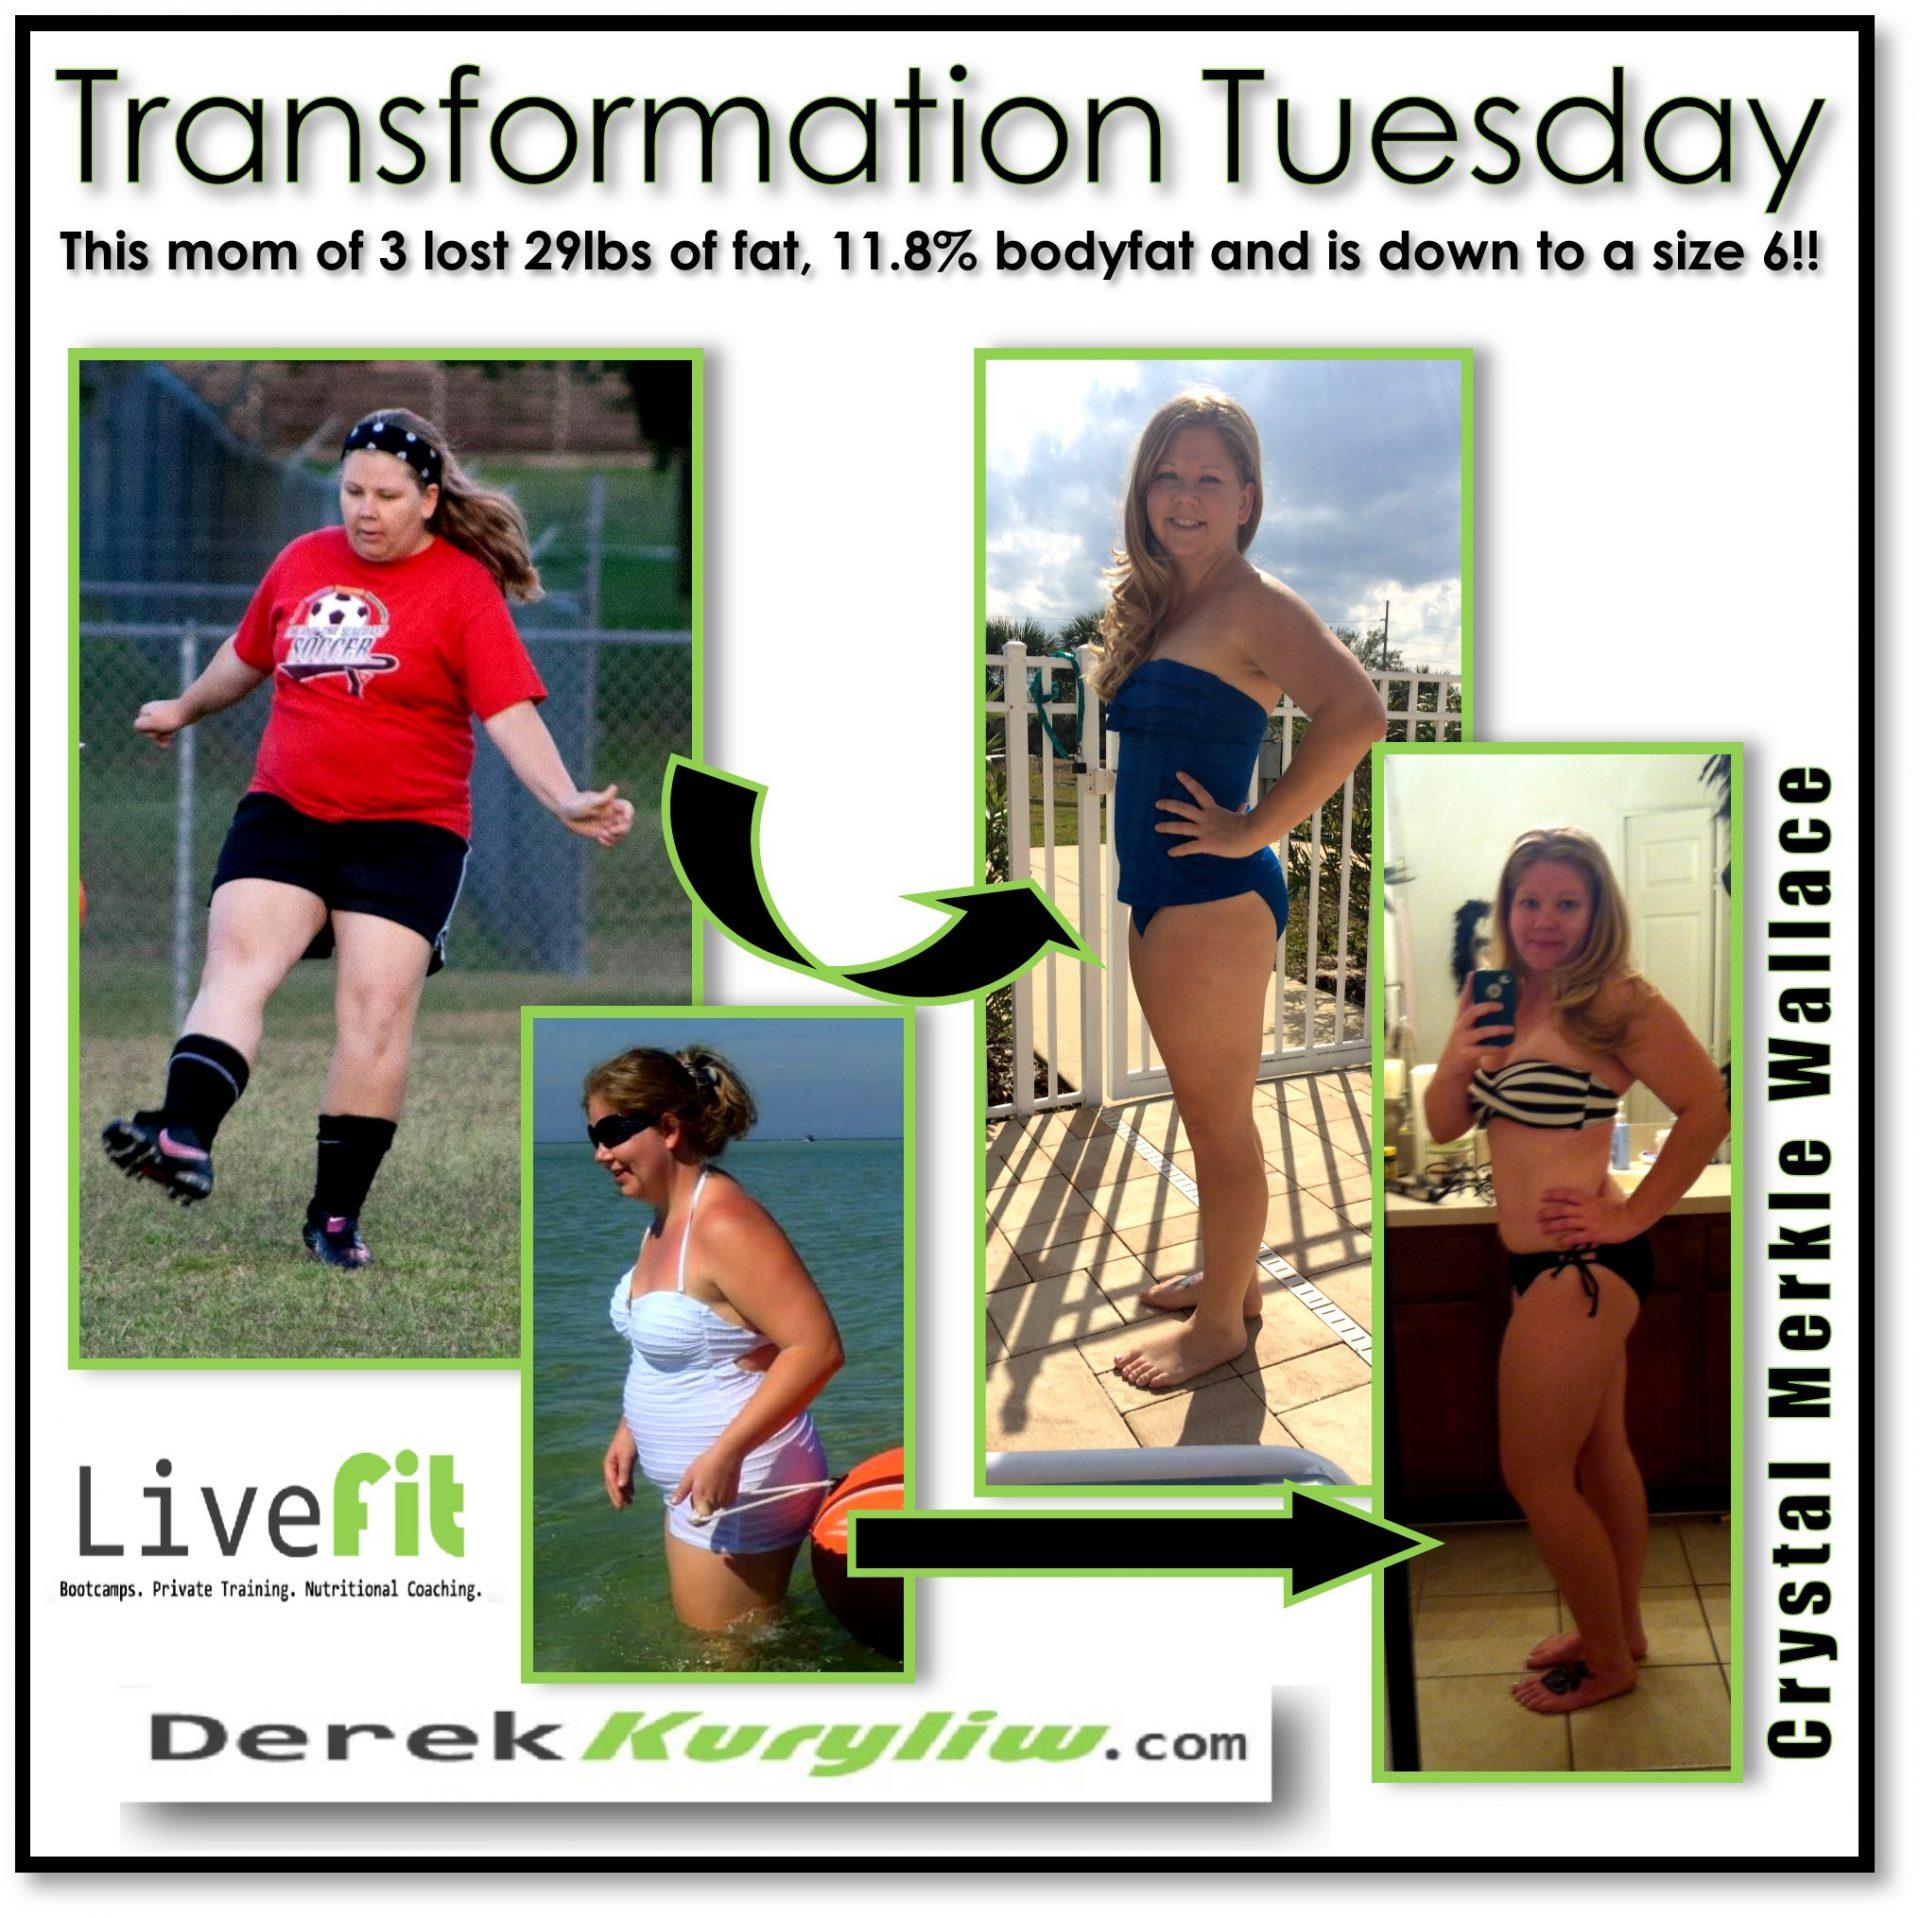 Mother of 3 finds HUGE success (don't just get fit, Live Fit!)